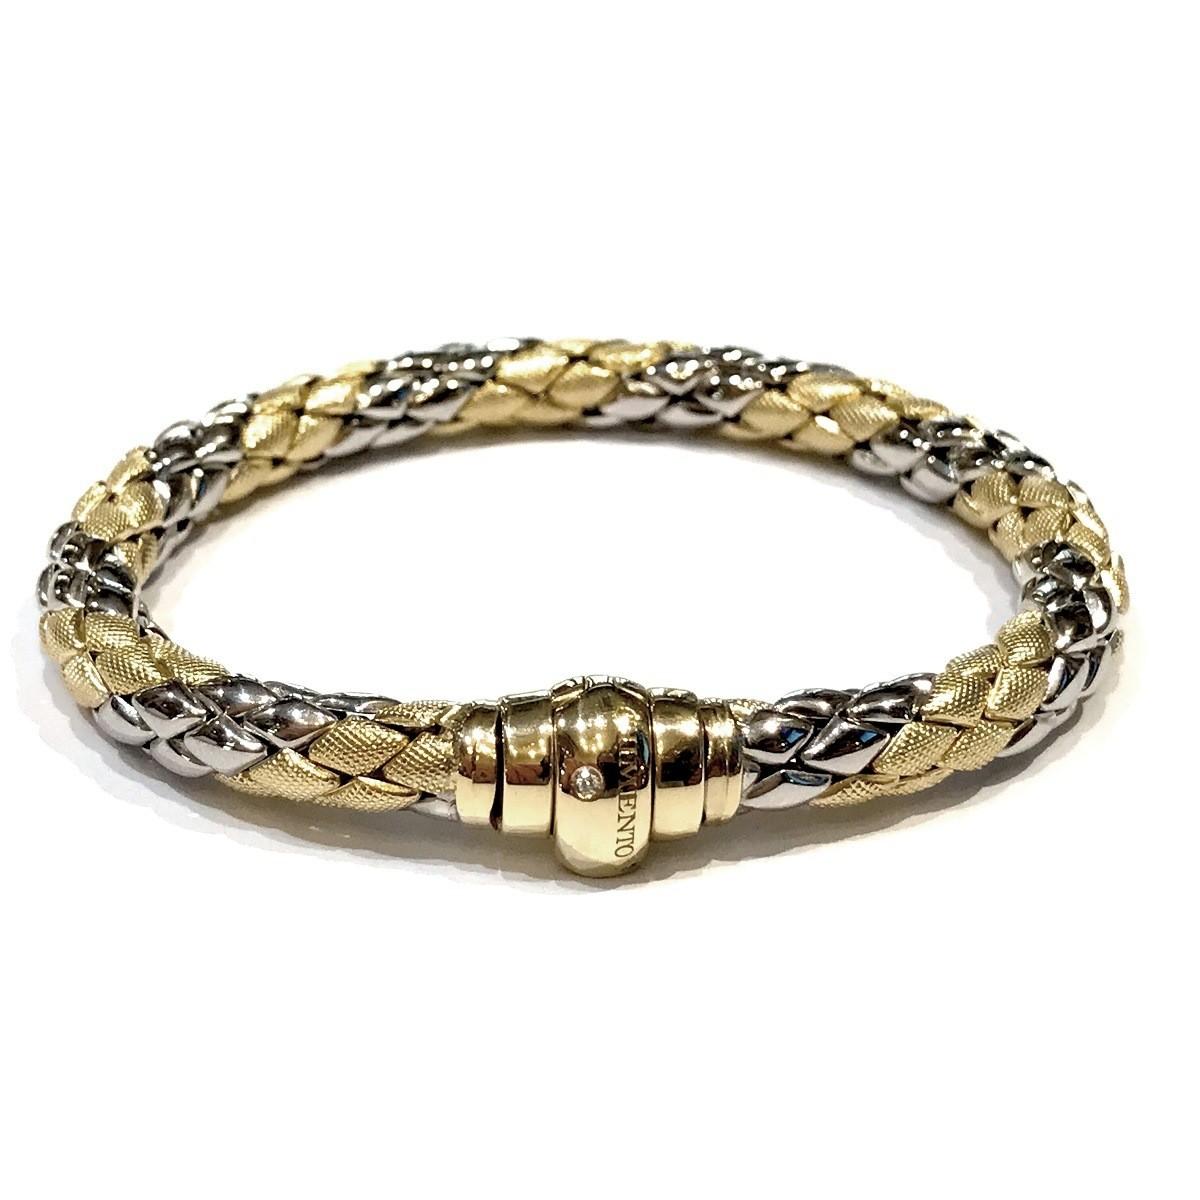 Gold bracelets - ASSISI JEWELS